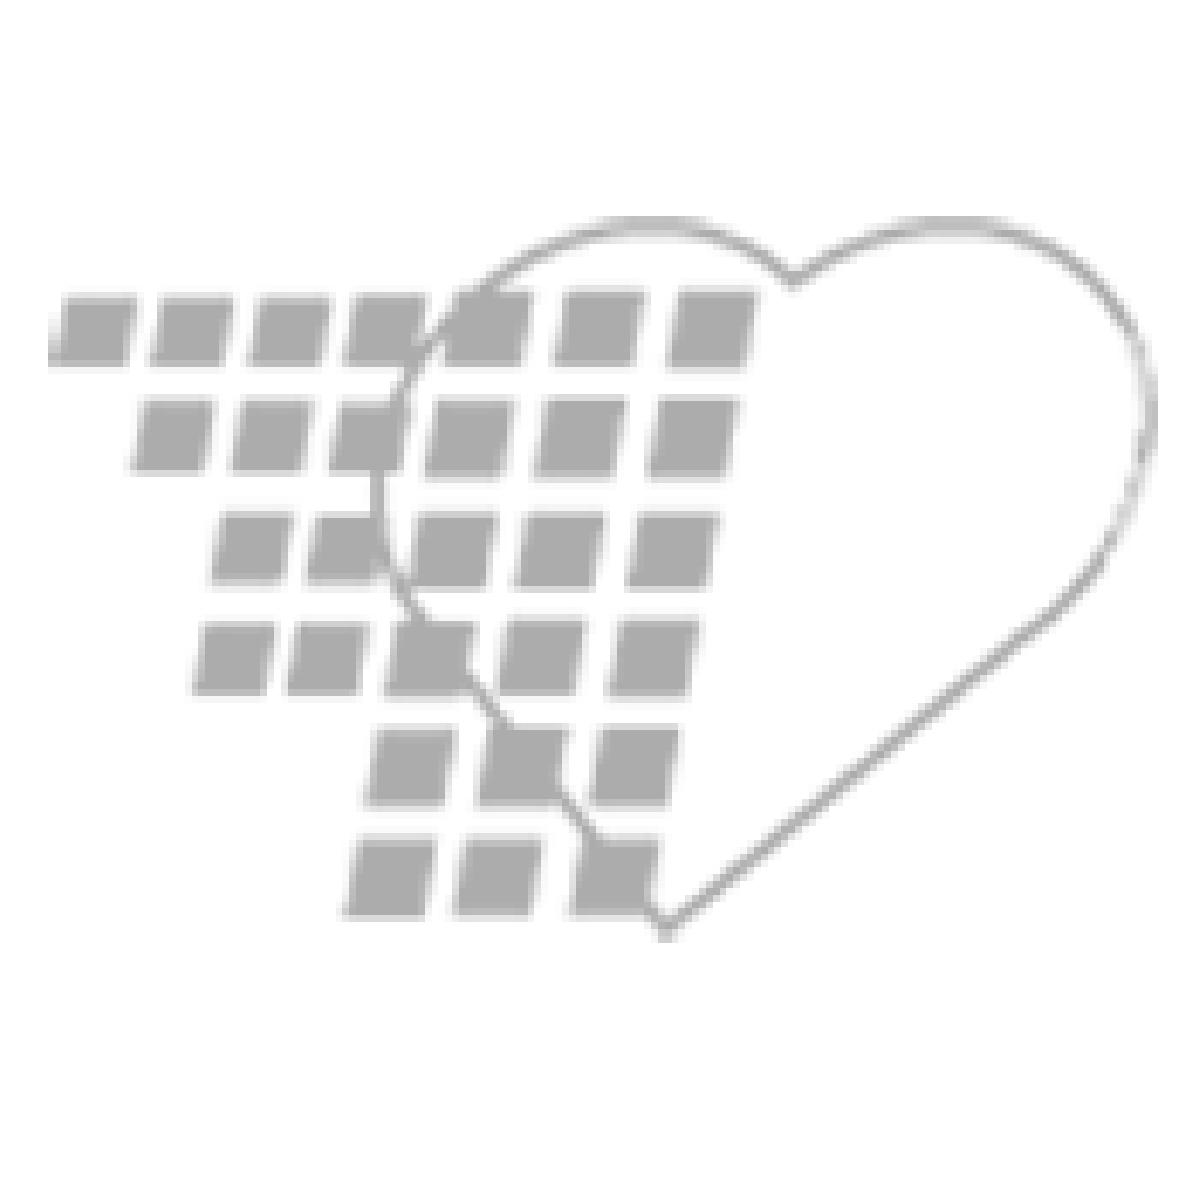 12-81-8850 Cardionics Pediatric Auscultation Trainer